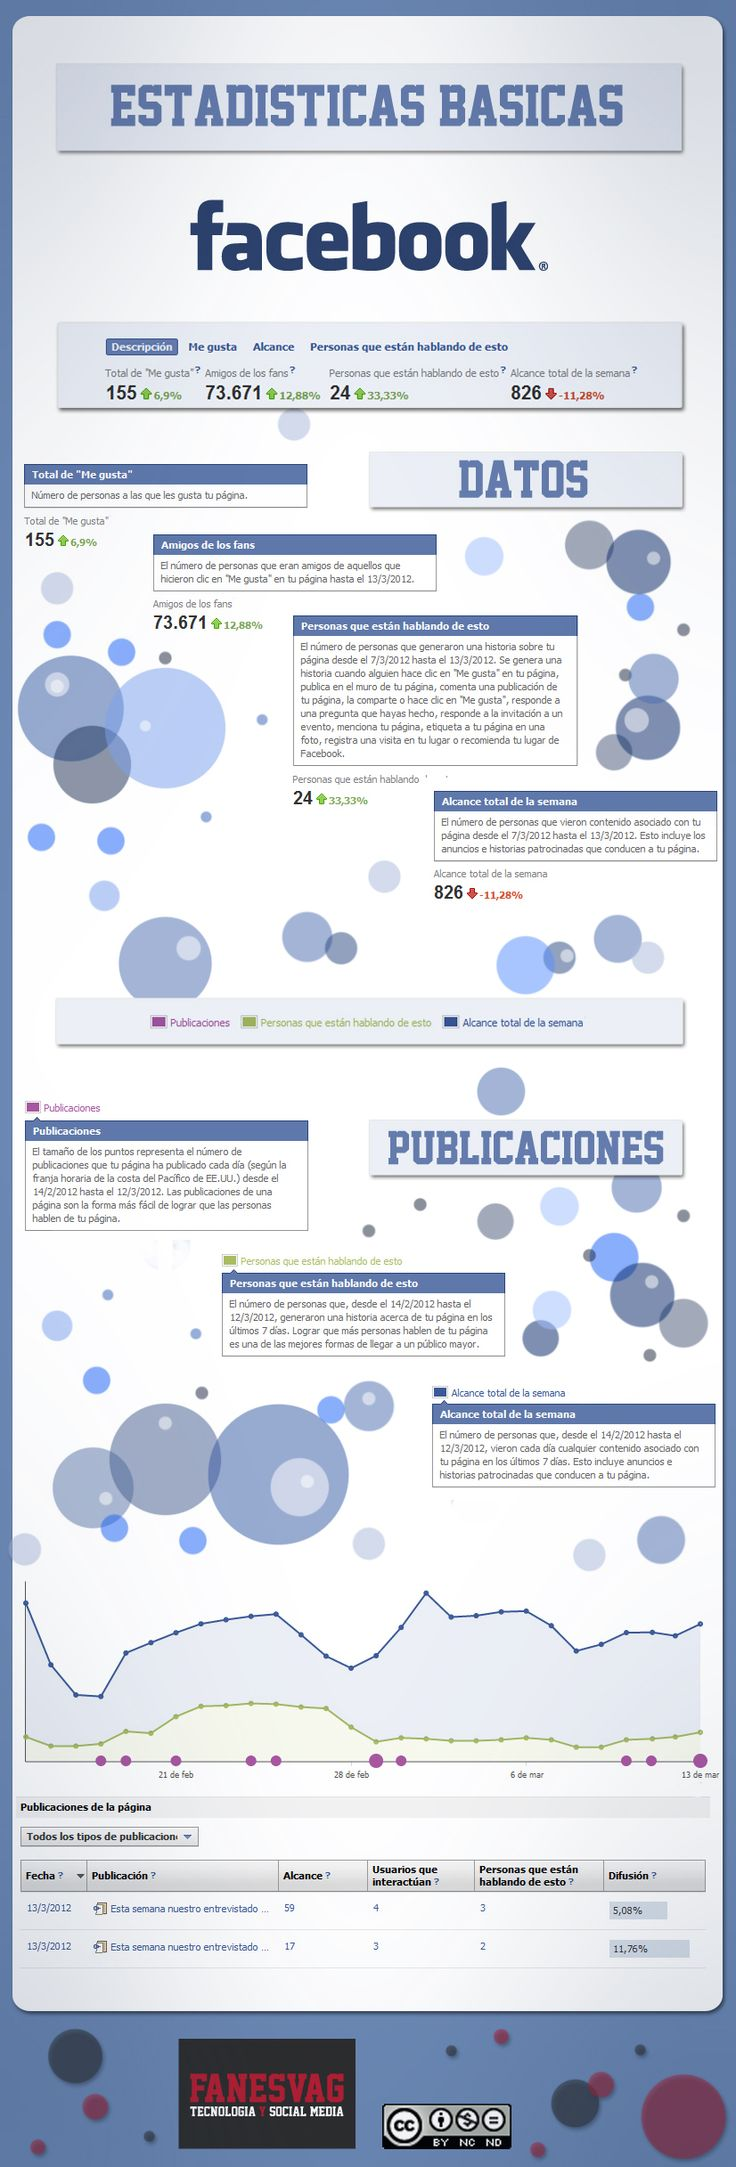 Estadísticas Básicas de Facebook #infografia